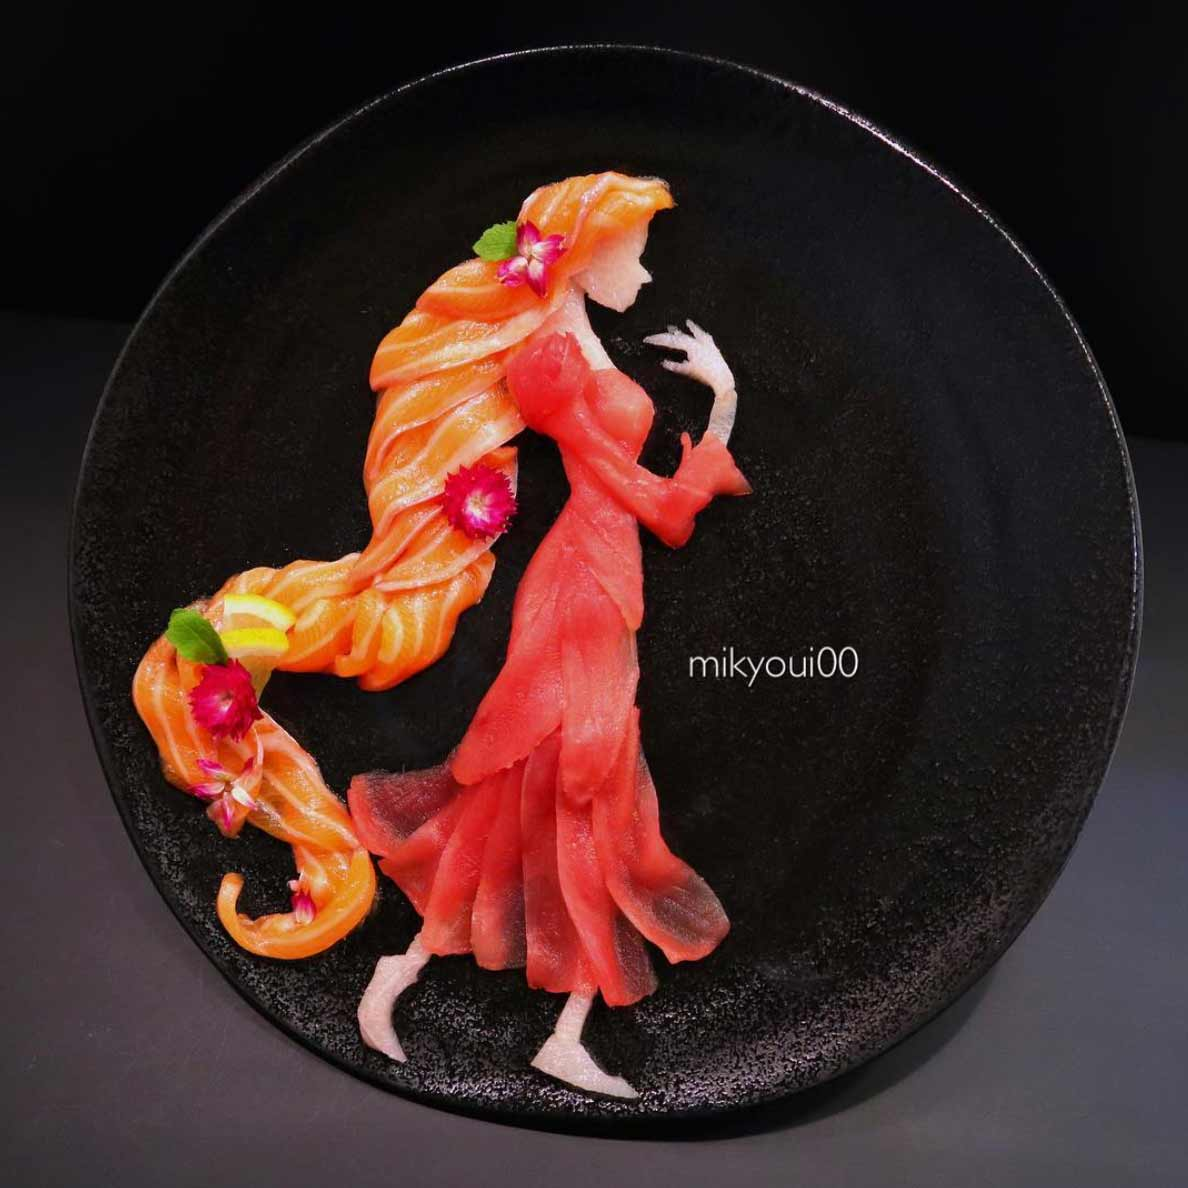 Wundervolle Sashimi-Kunstwerke von mikyou mikyou-sashimi-art-sushi-fischbilder_09